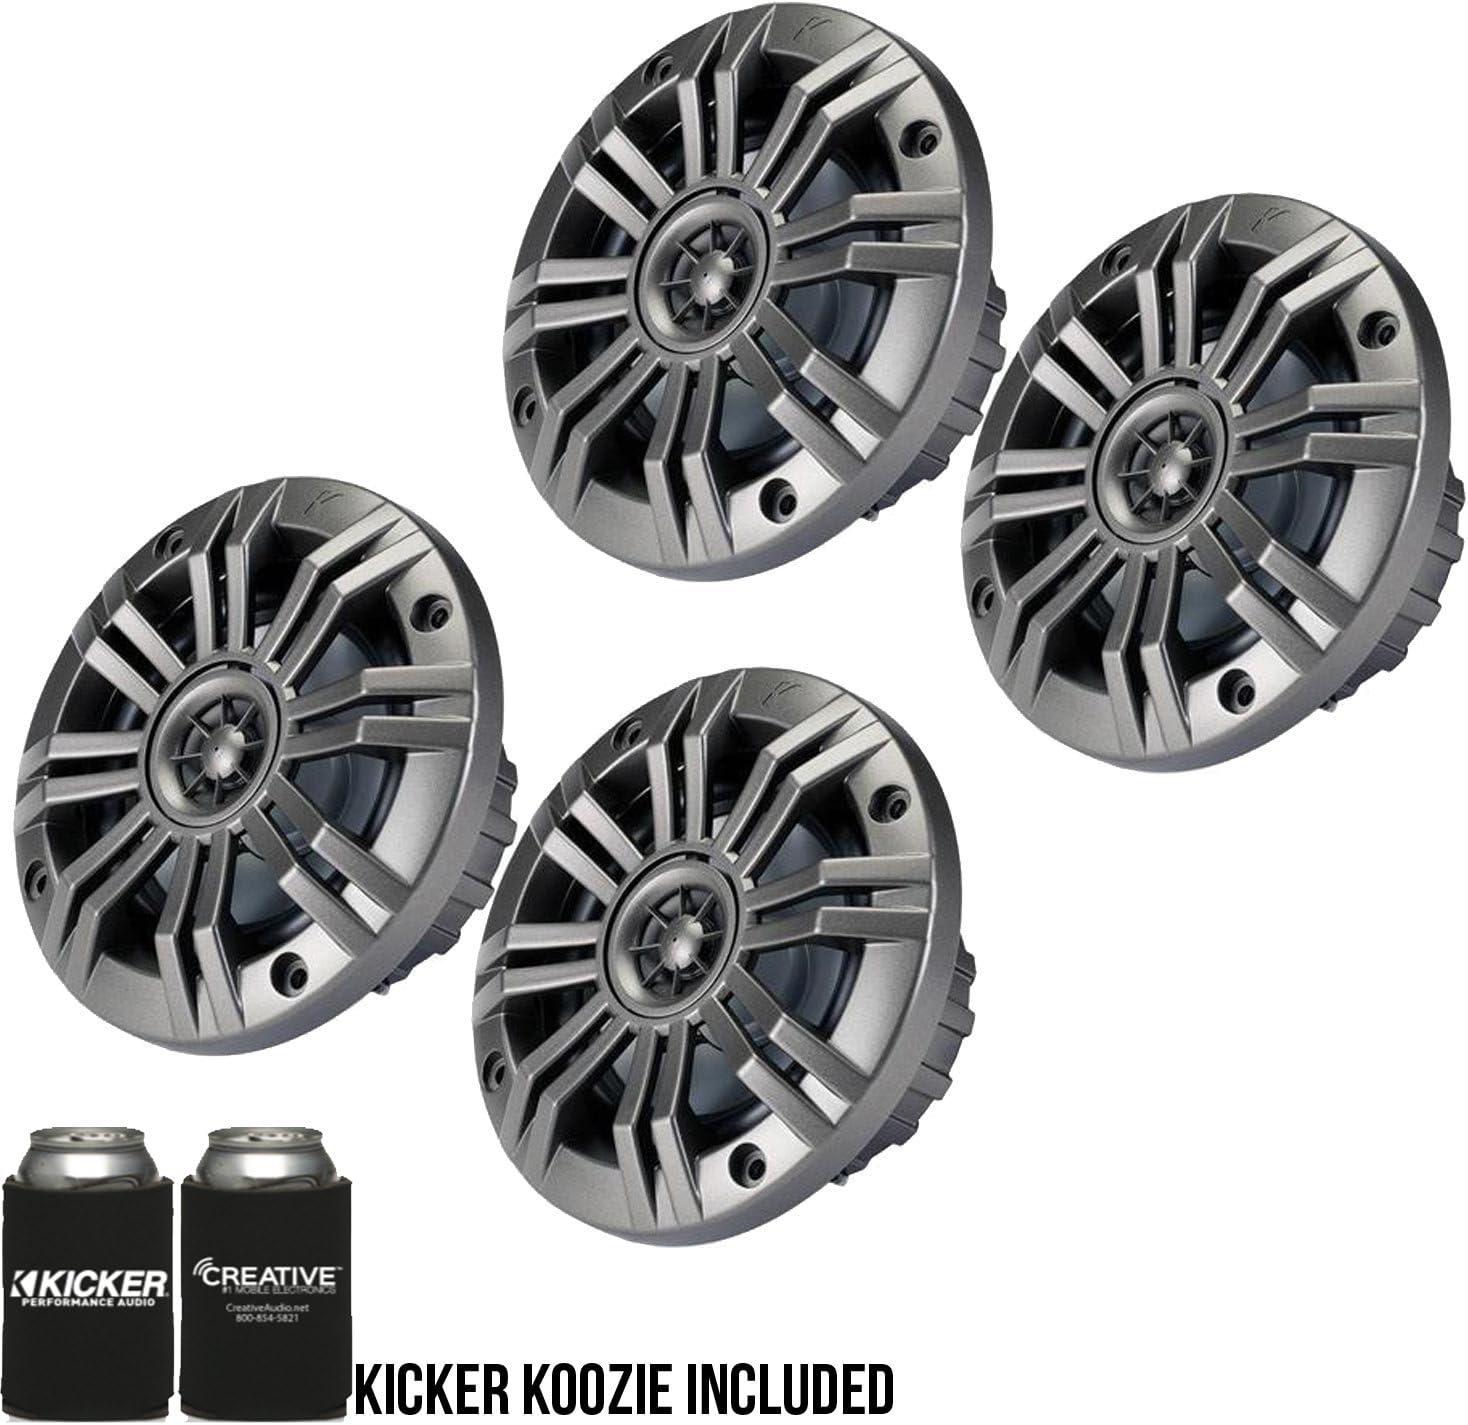 Kicker 4 Inch KM-Series Marine Speaker Bundle 41KM44CW with Black Wake Tower Enclosure